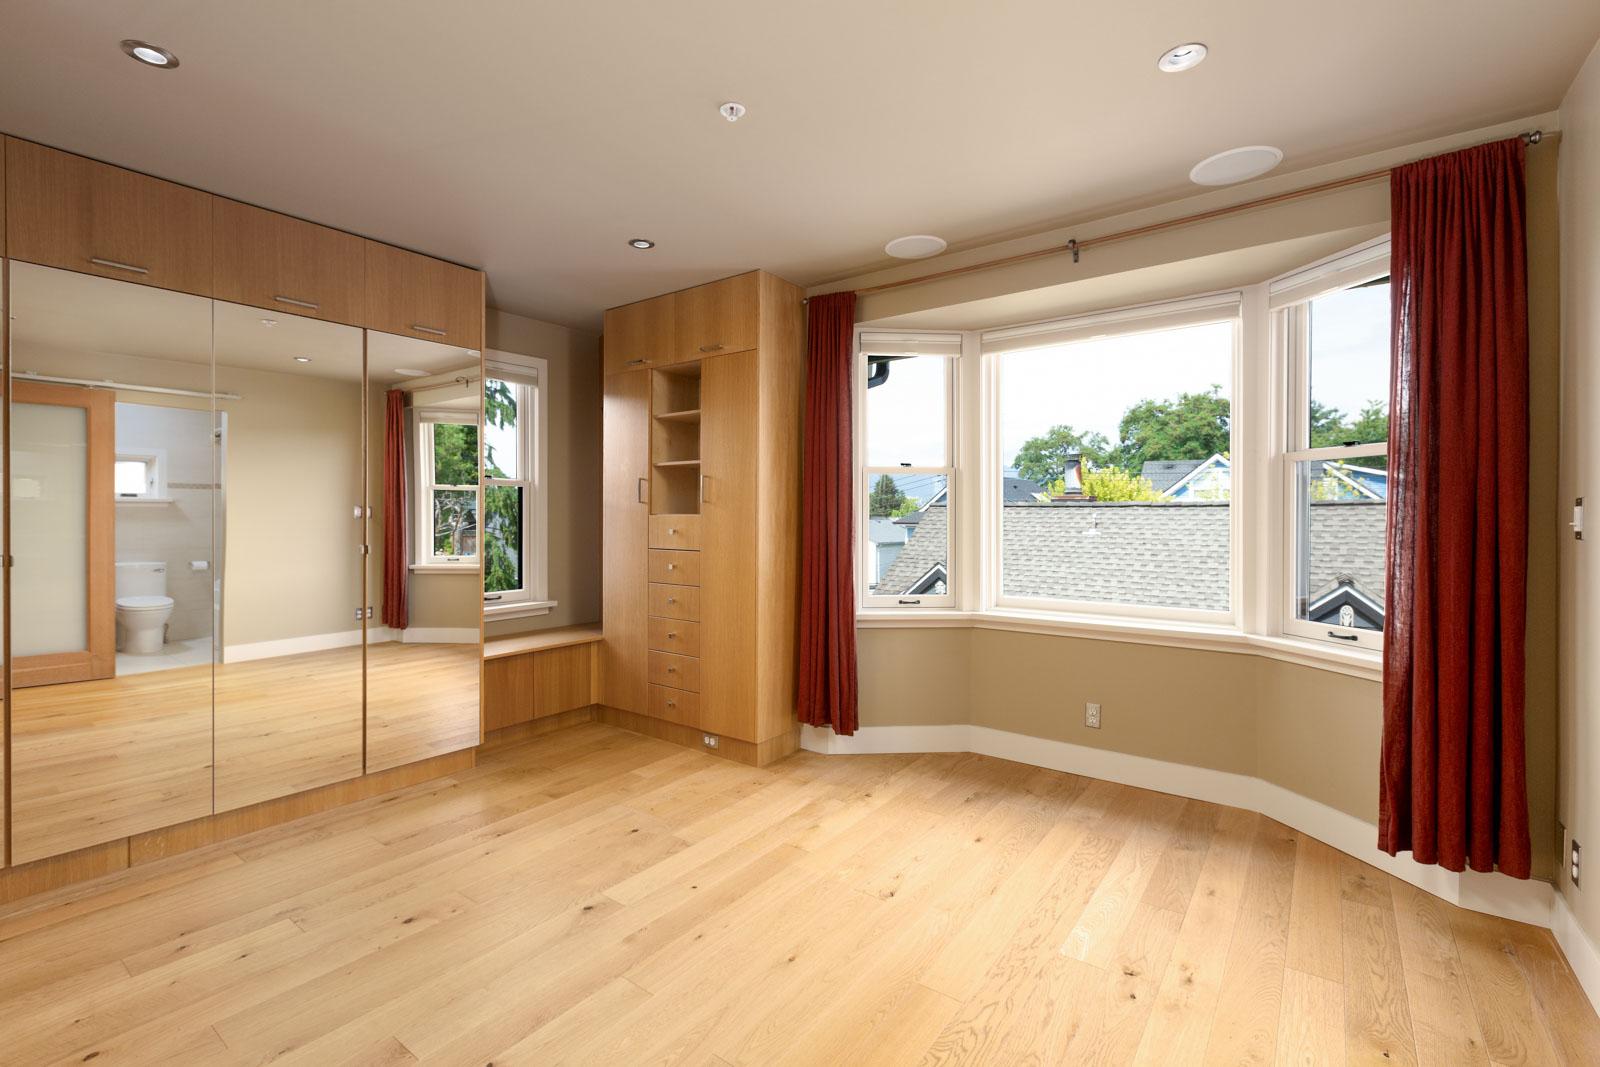 living room area with huge windows